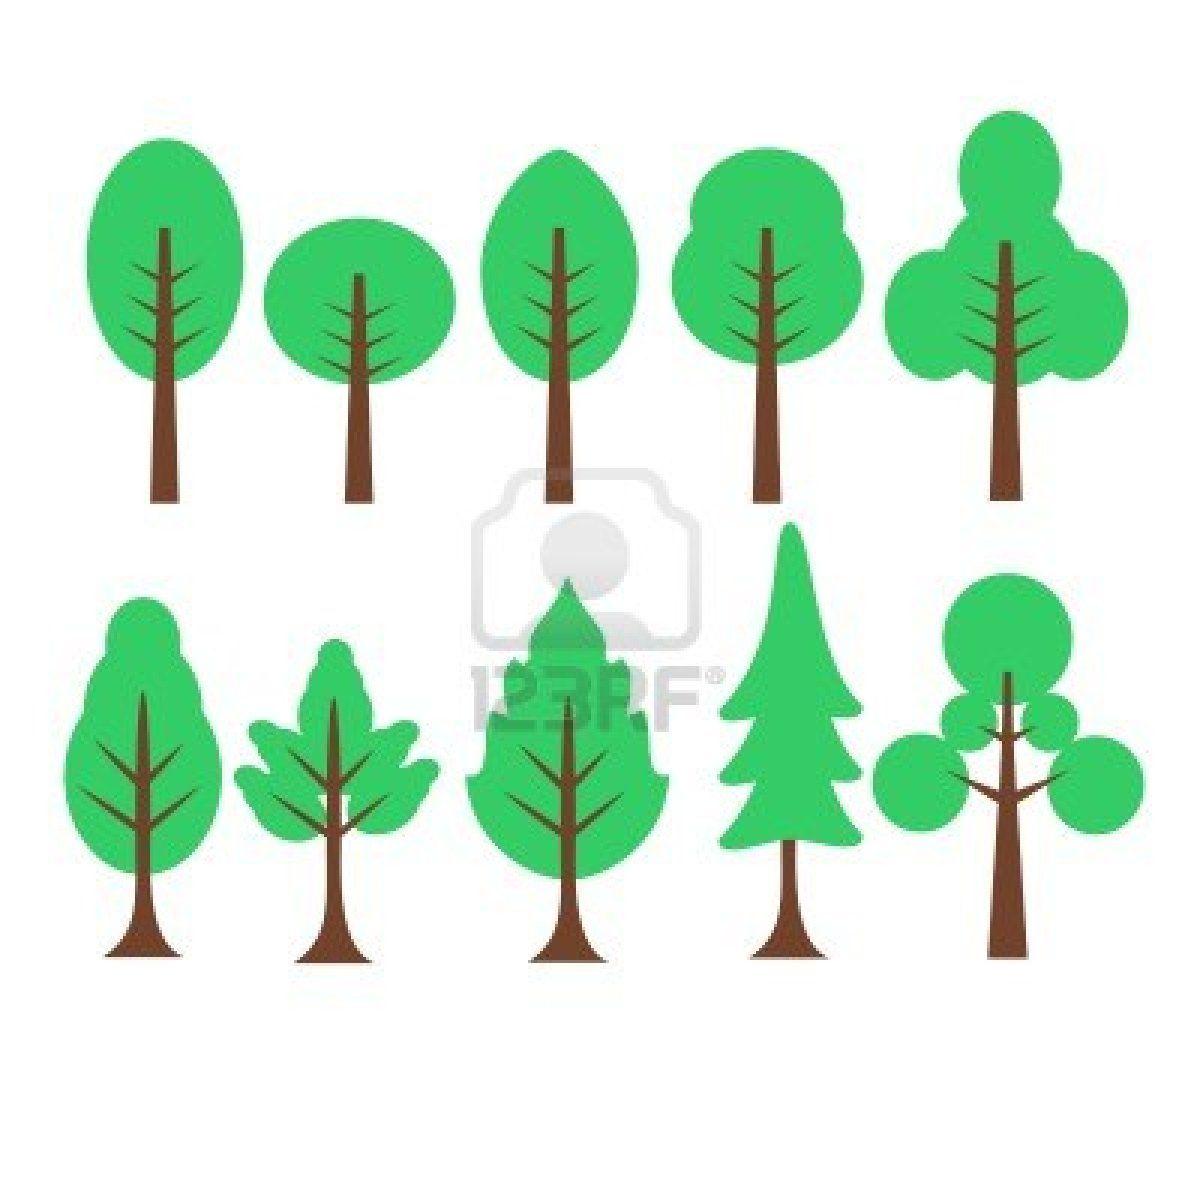 Cartoon Tree Graphi Illustration Royalty Free Cliparts, Vectors, And Stock Illustration. Image 18700370.